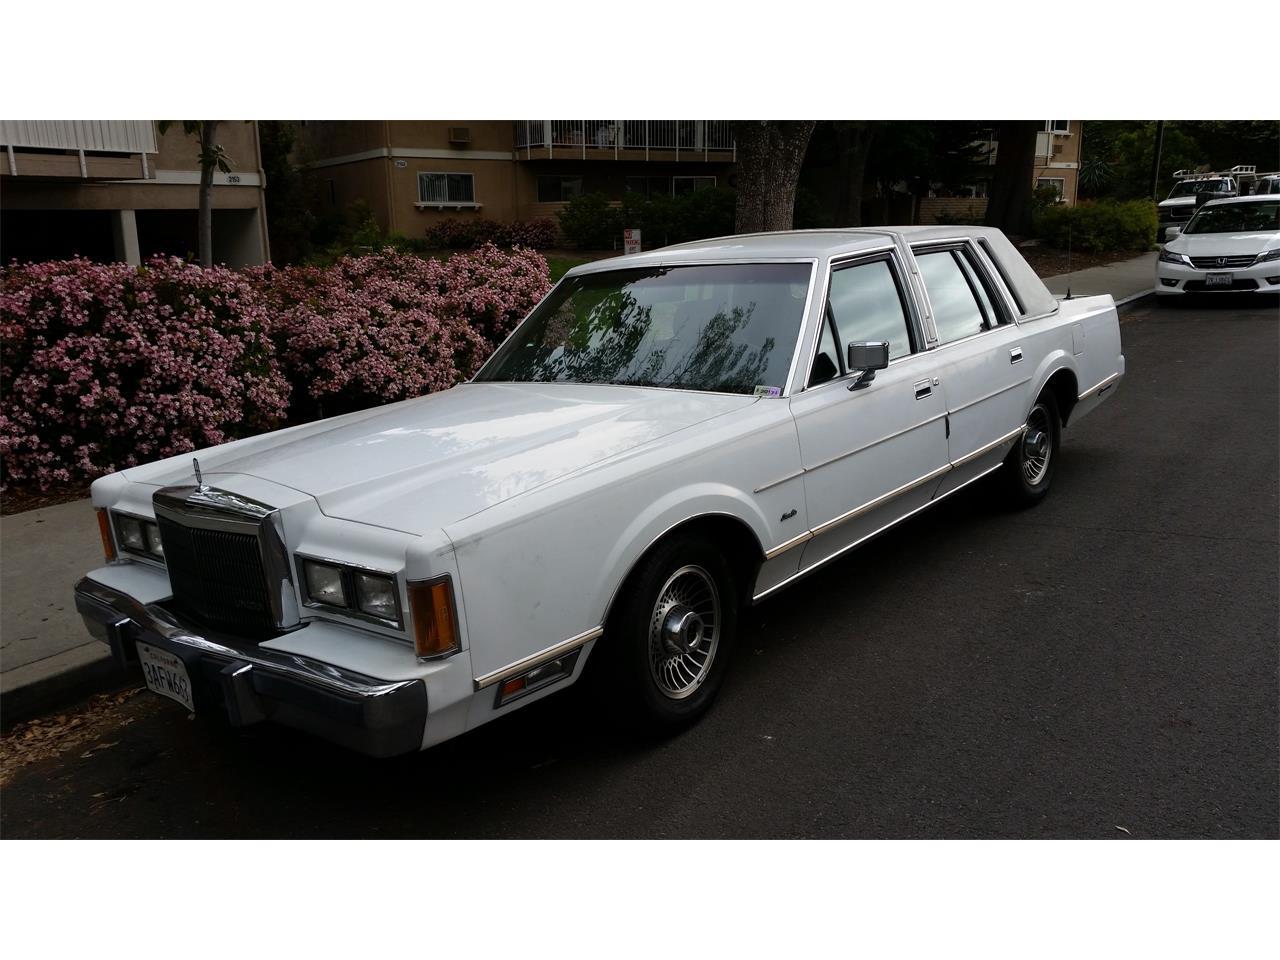 1989 Lincoln Town Car (CC-1208868) for sale in Laguna Woods, California